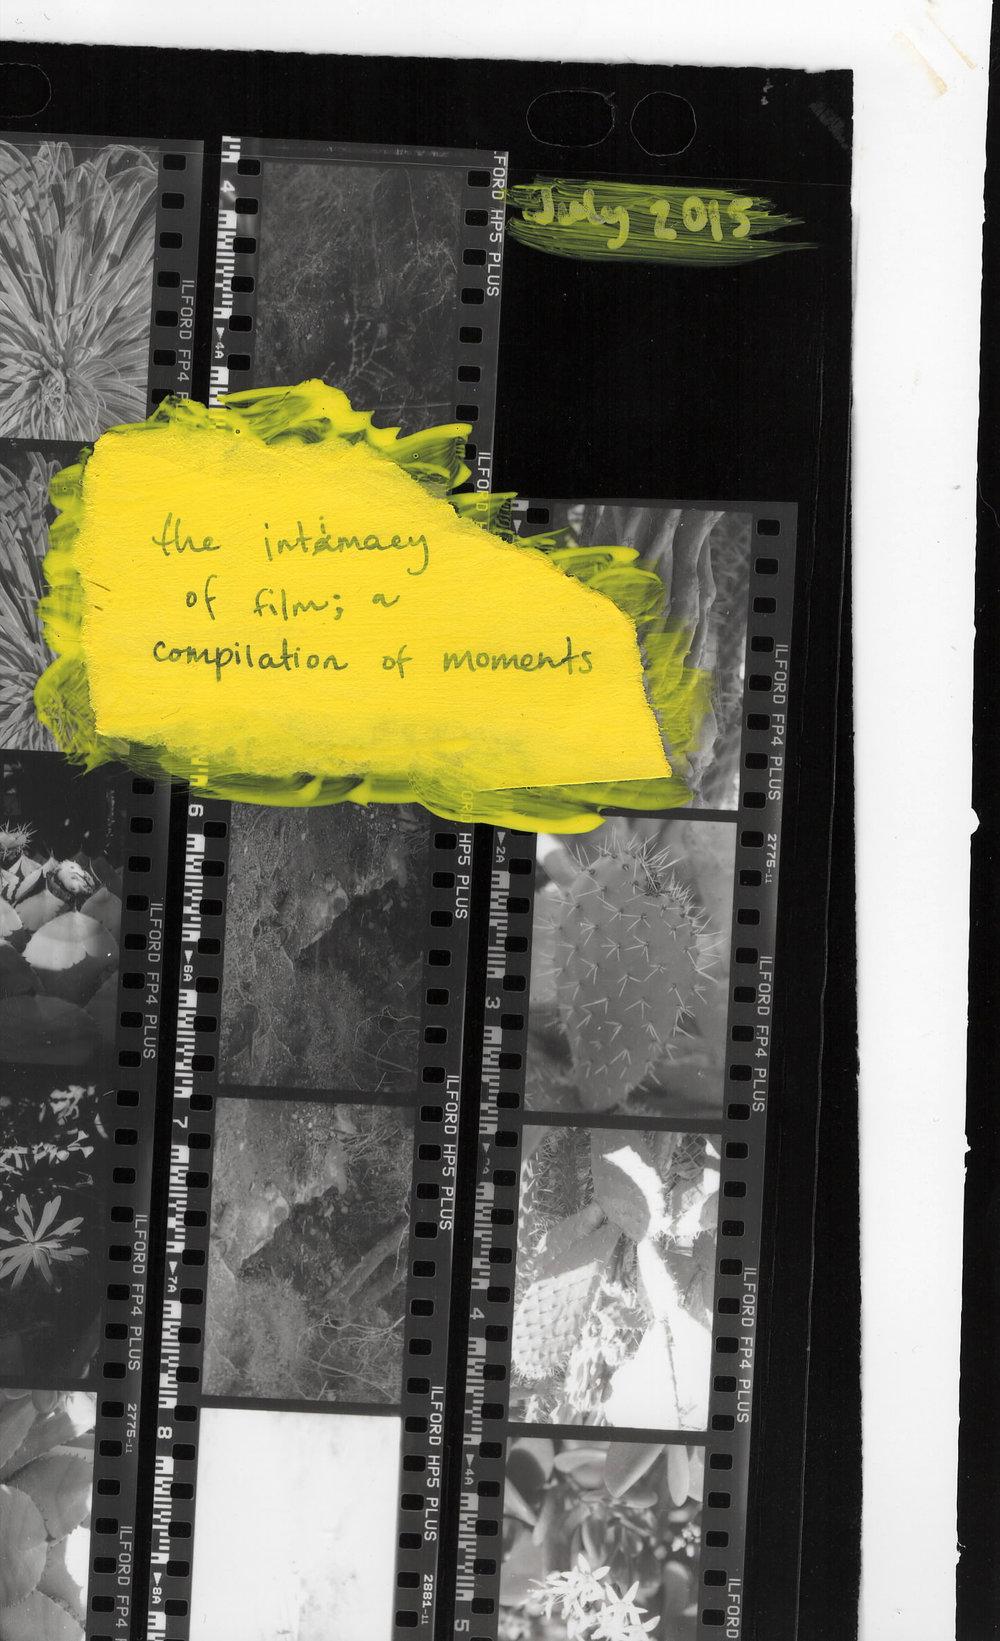 the intimacy of film.jpg